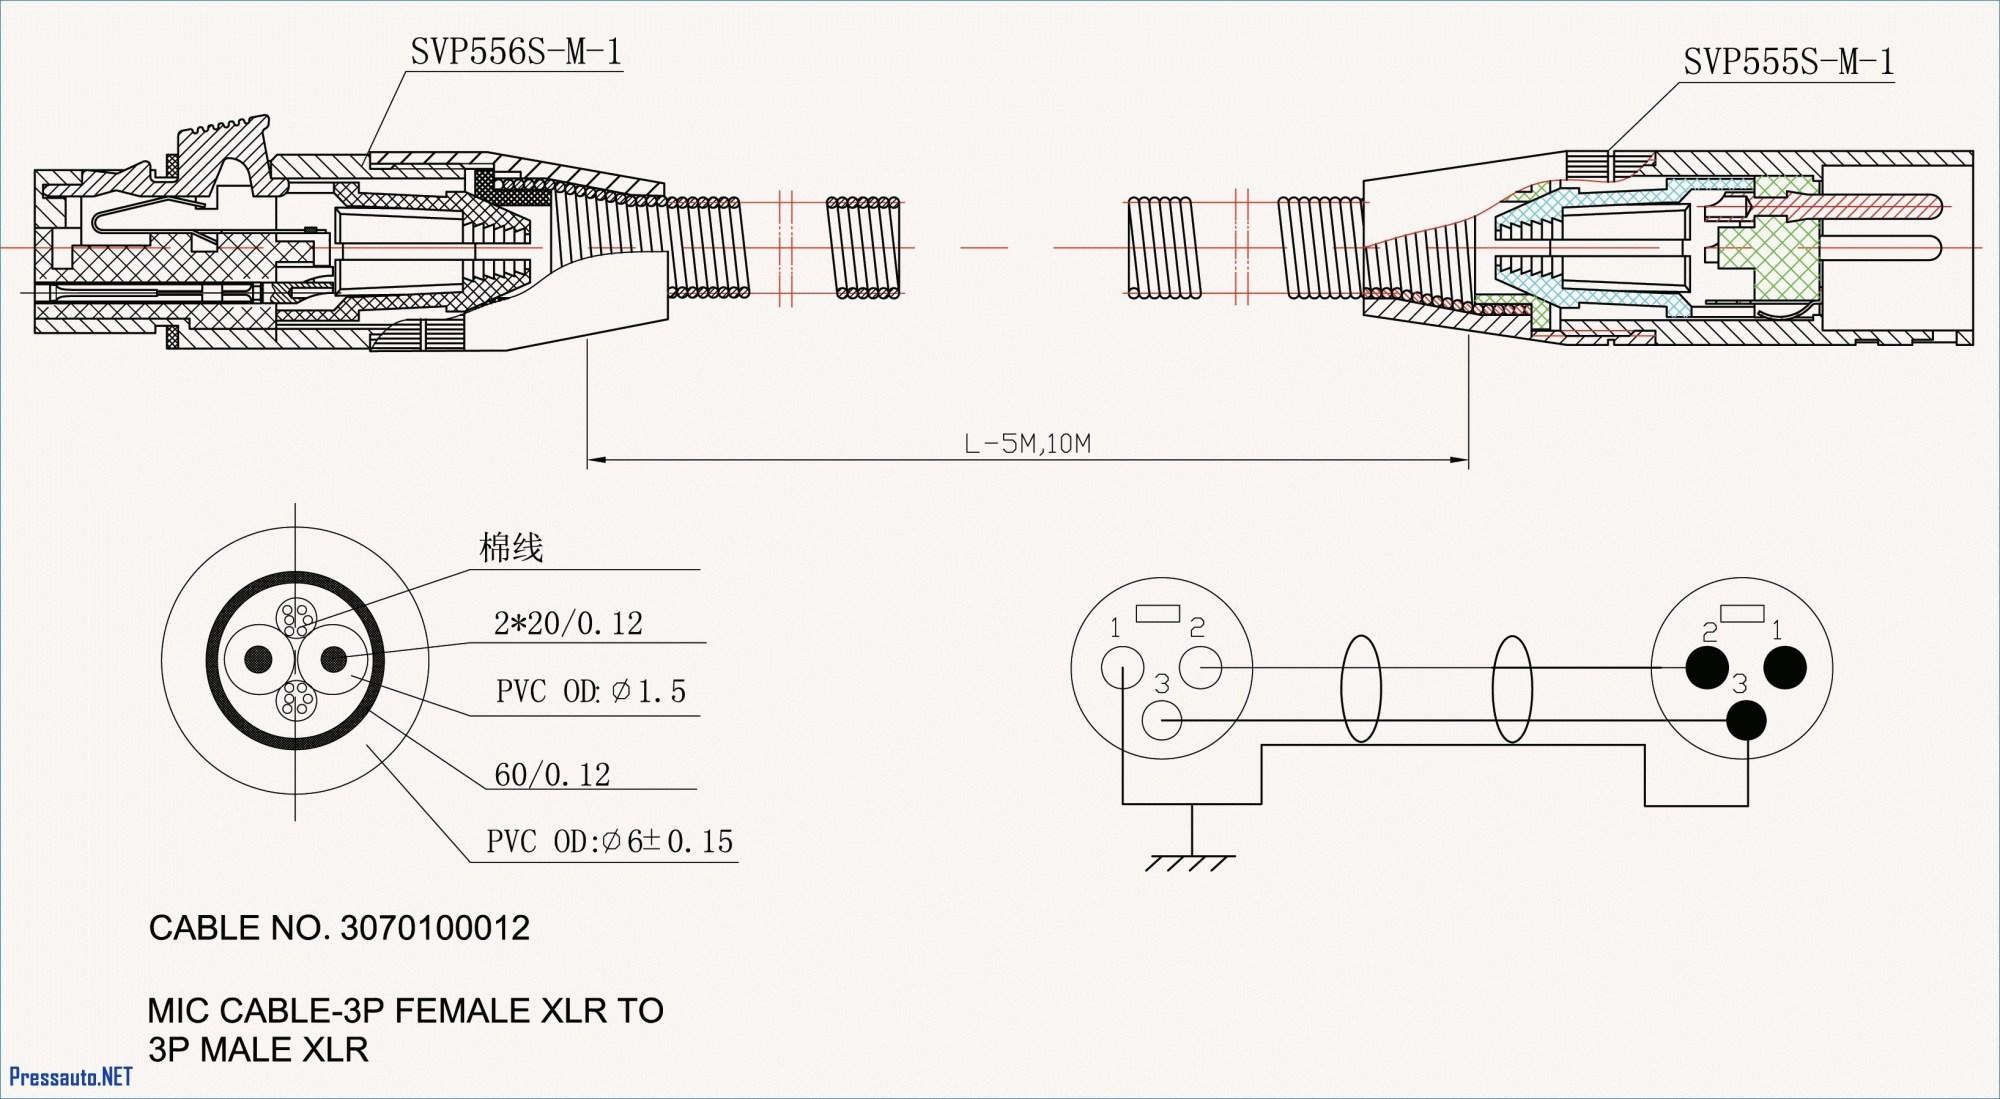 hight resolution of gm tbi wiring diagram wiring library rh 73 codingcommunity de tpi wiring harness diagram chevy 350 wiring diagram